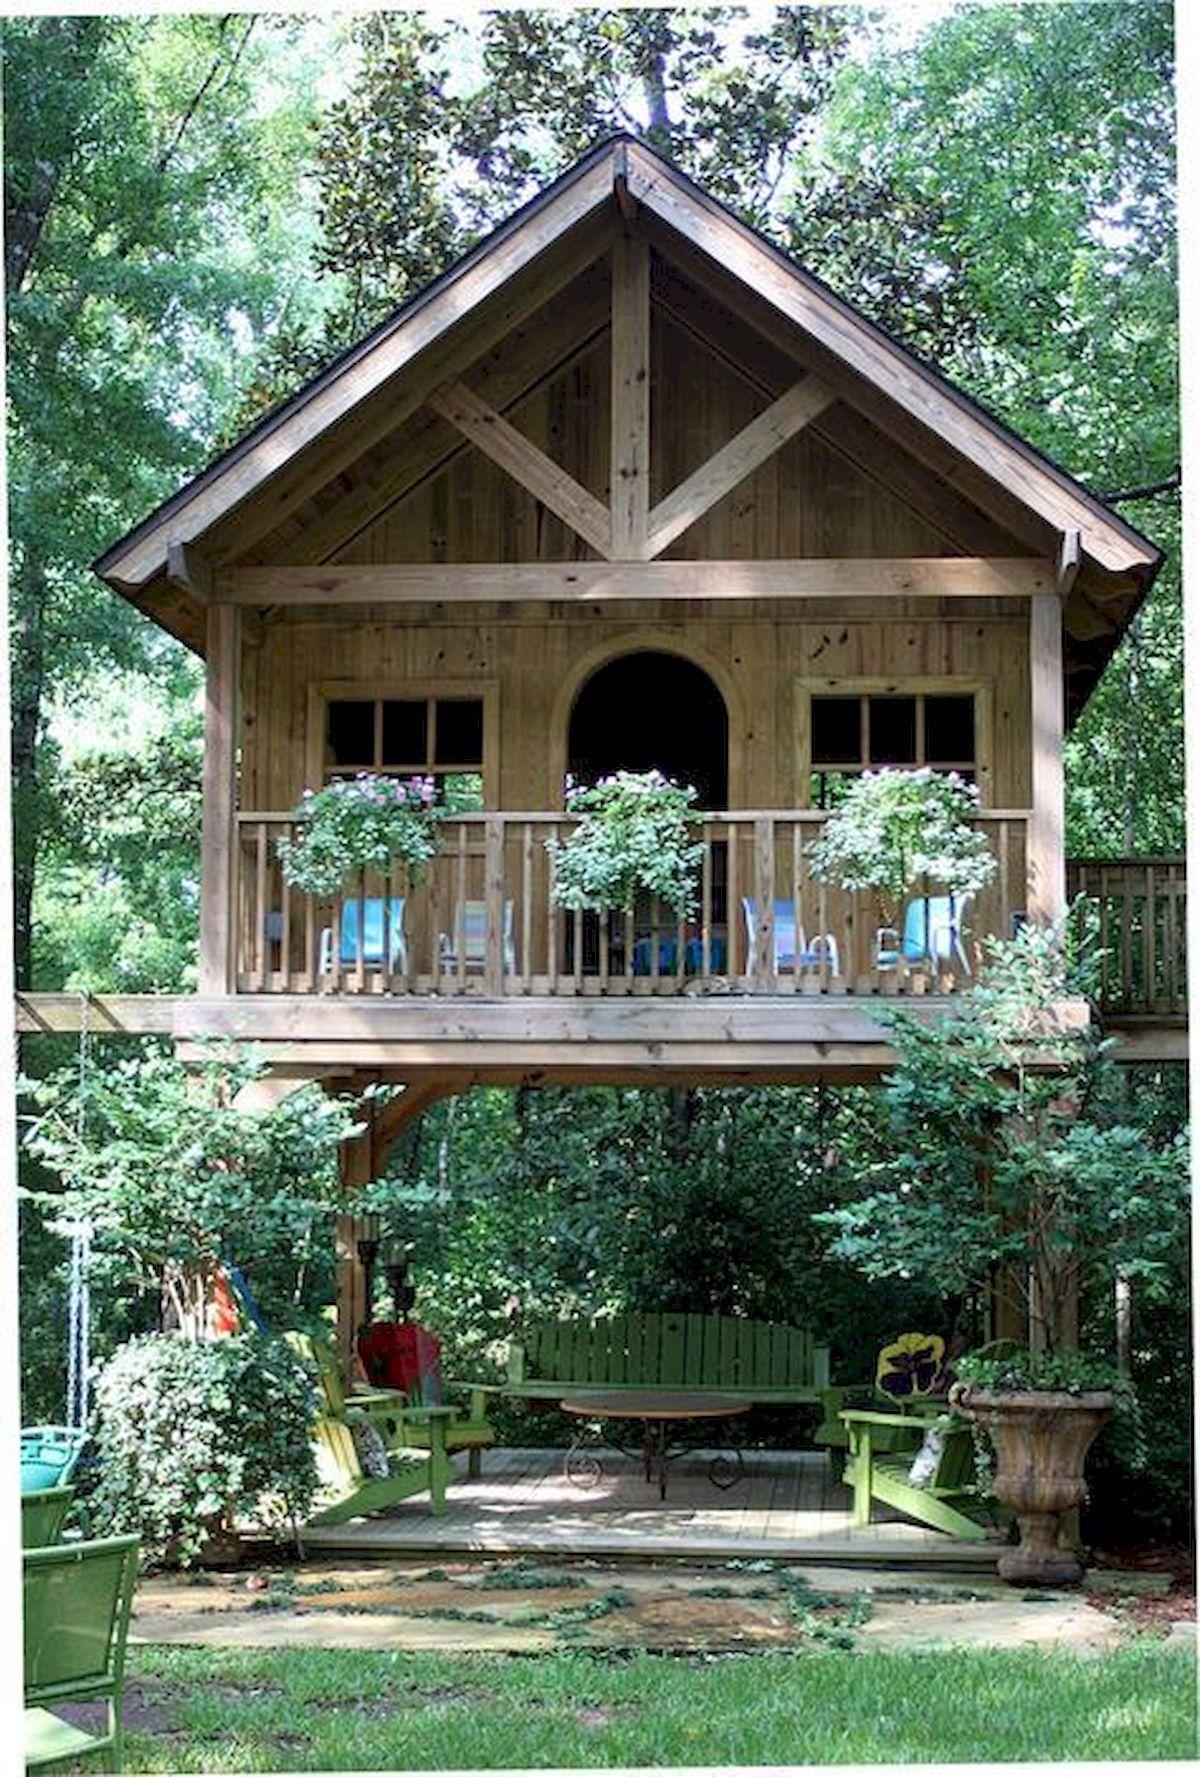 60 Adorable Farmhouse Cottage Design Ideas And Decor – Googodecor – Plantas e jardim